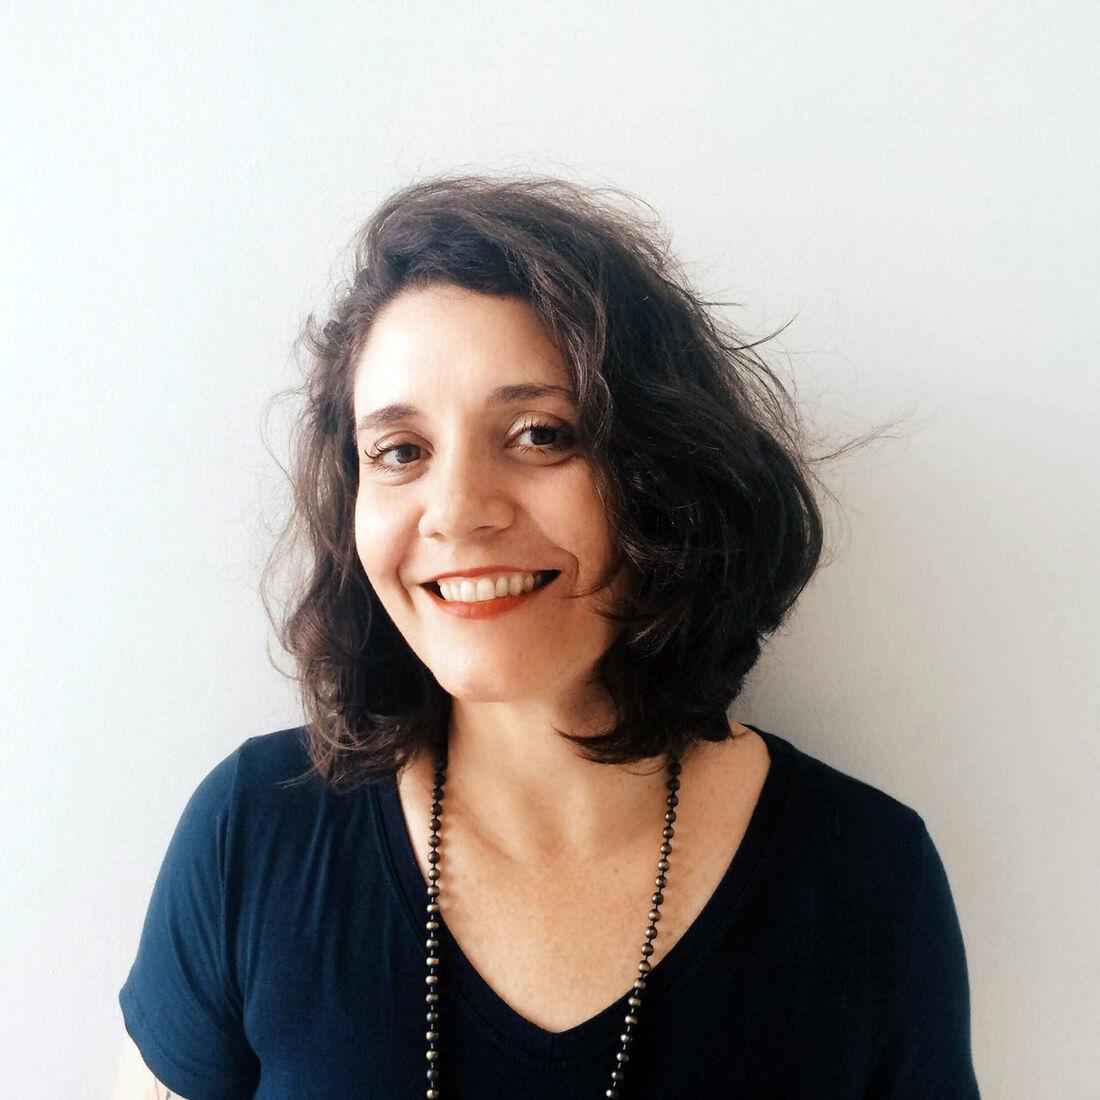 Carol Botelho